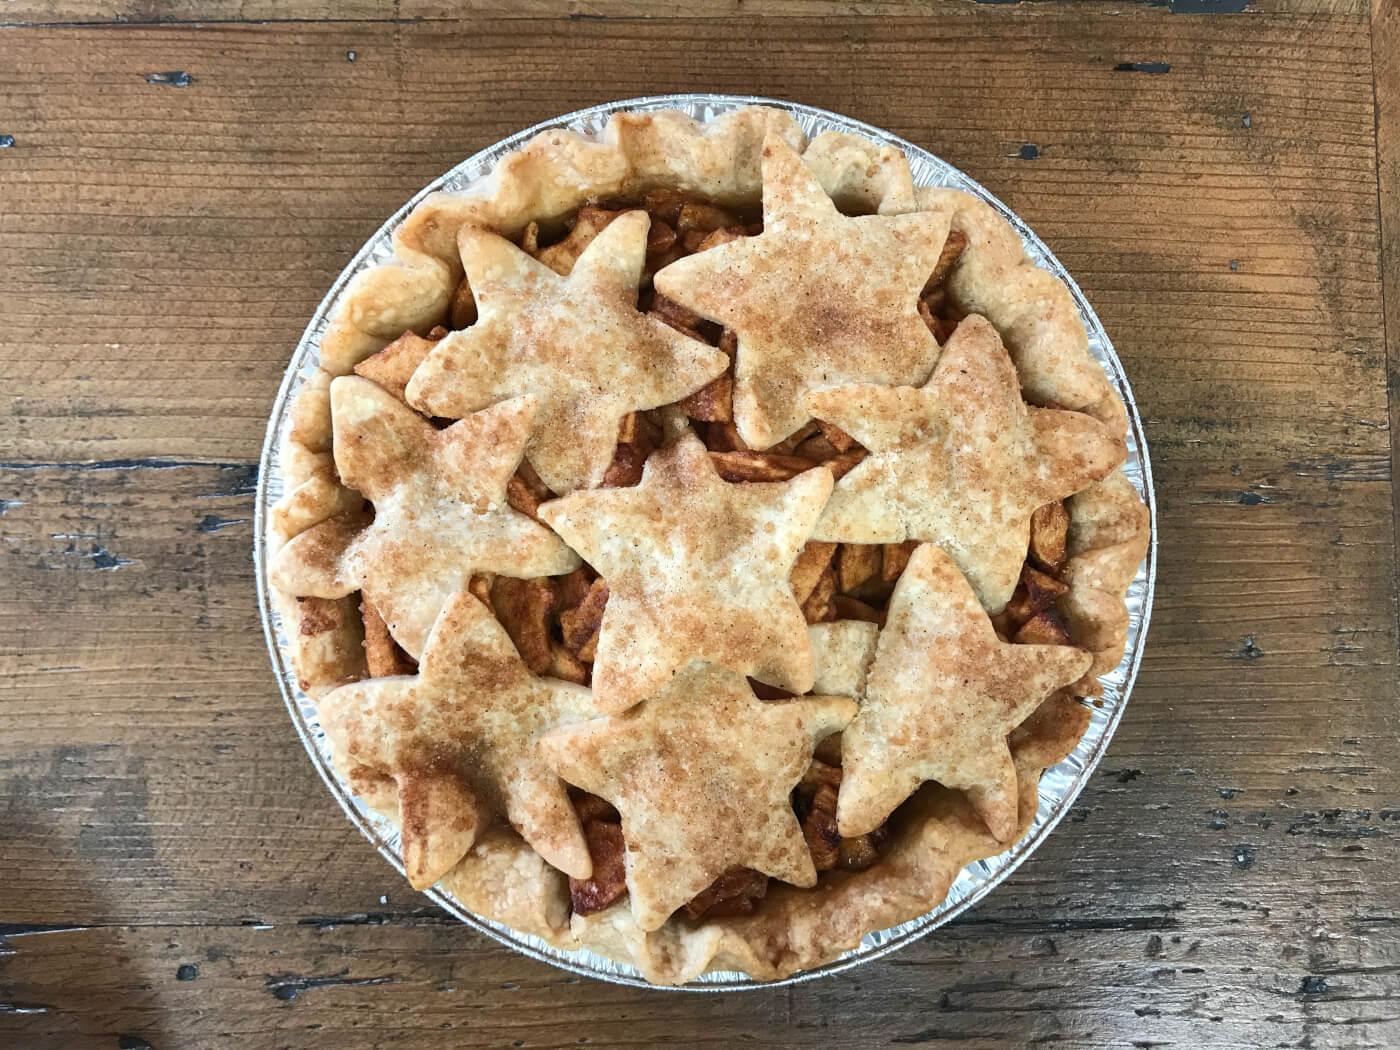 Apple Pie, America